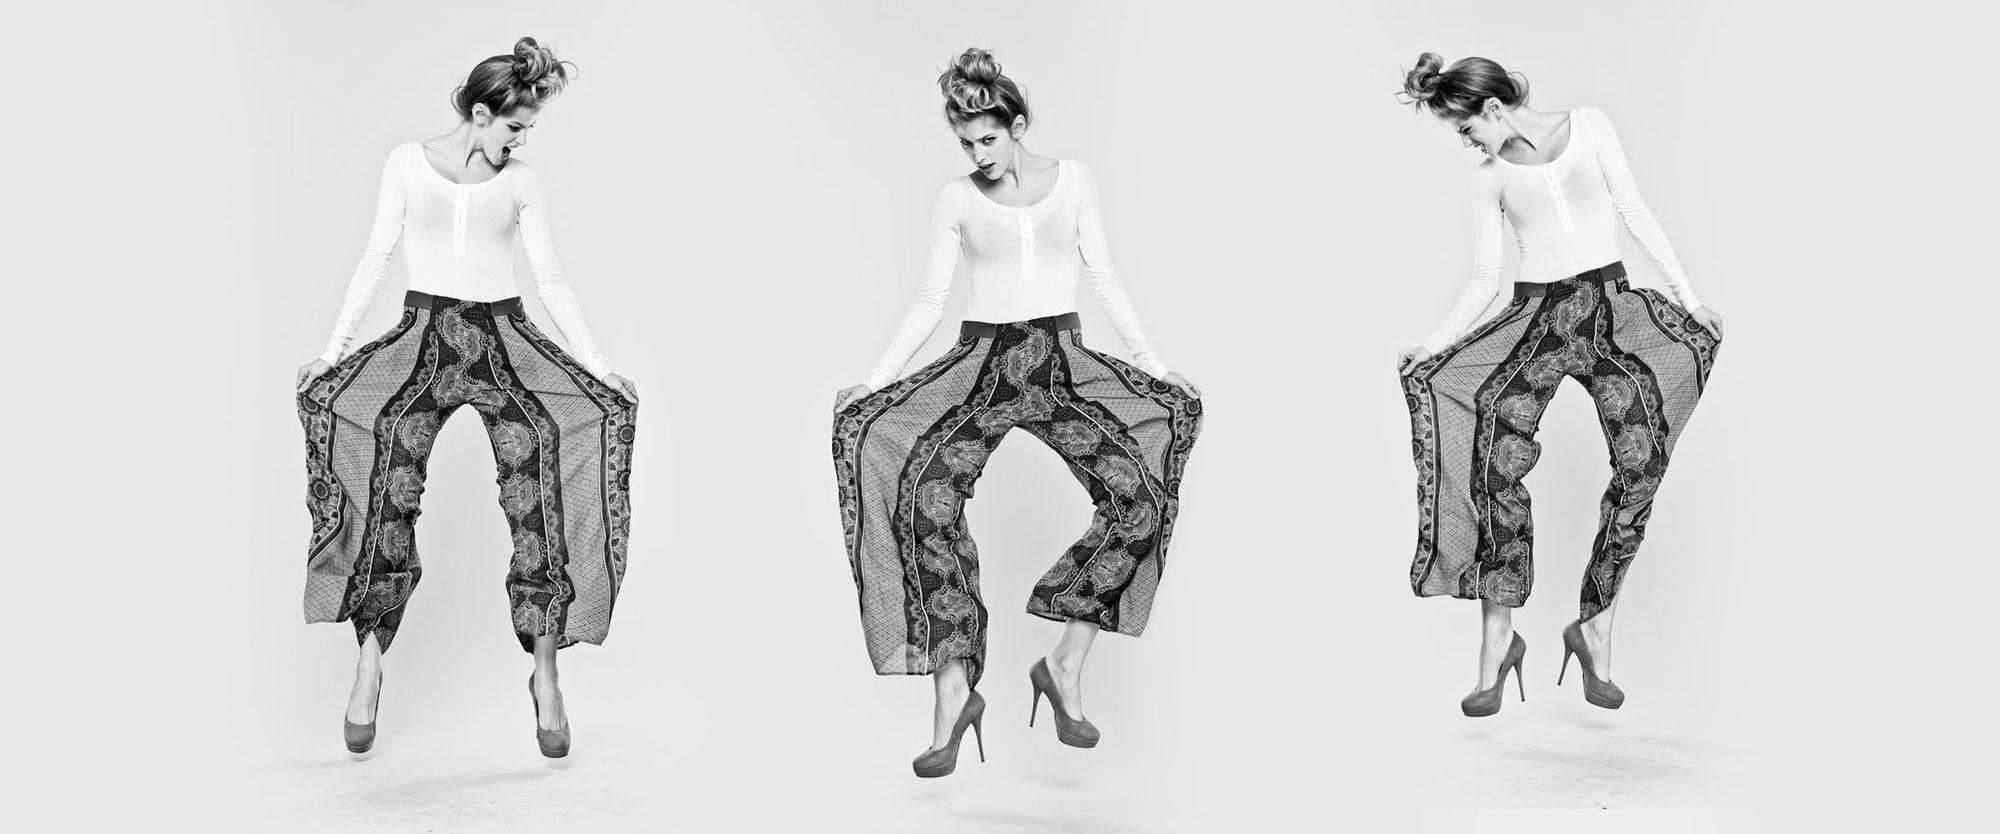 betta-lemme-jumping-in-a-creative-fashion.jpg